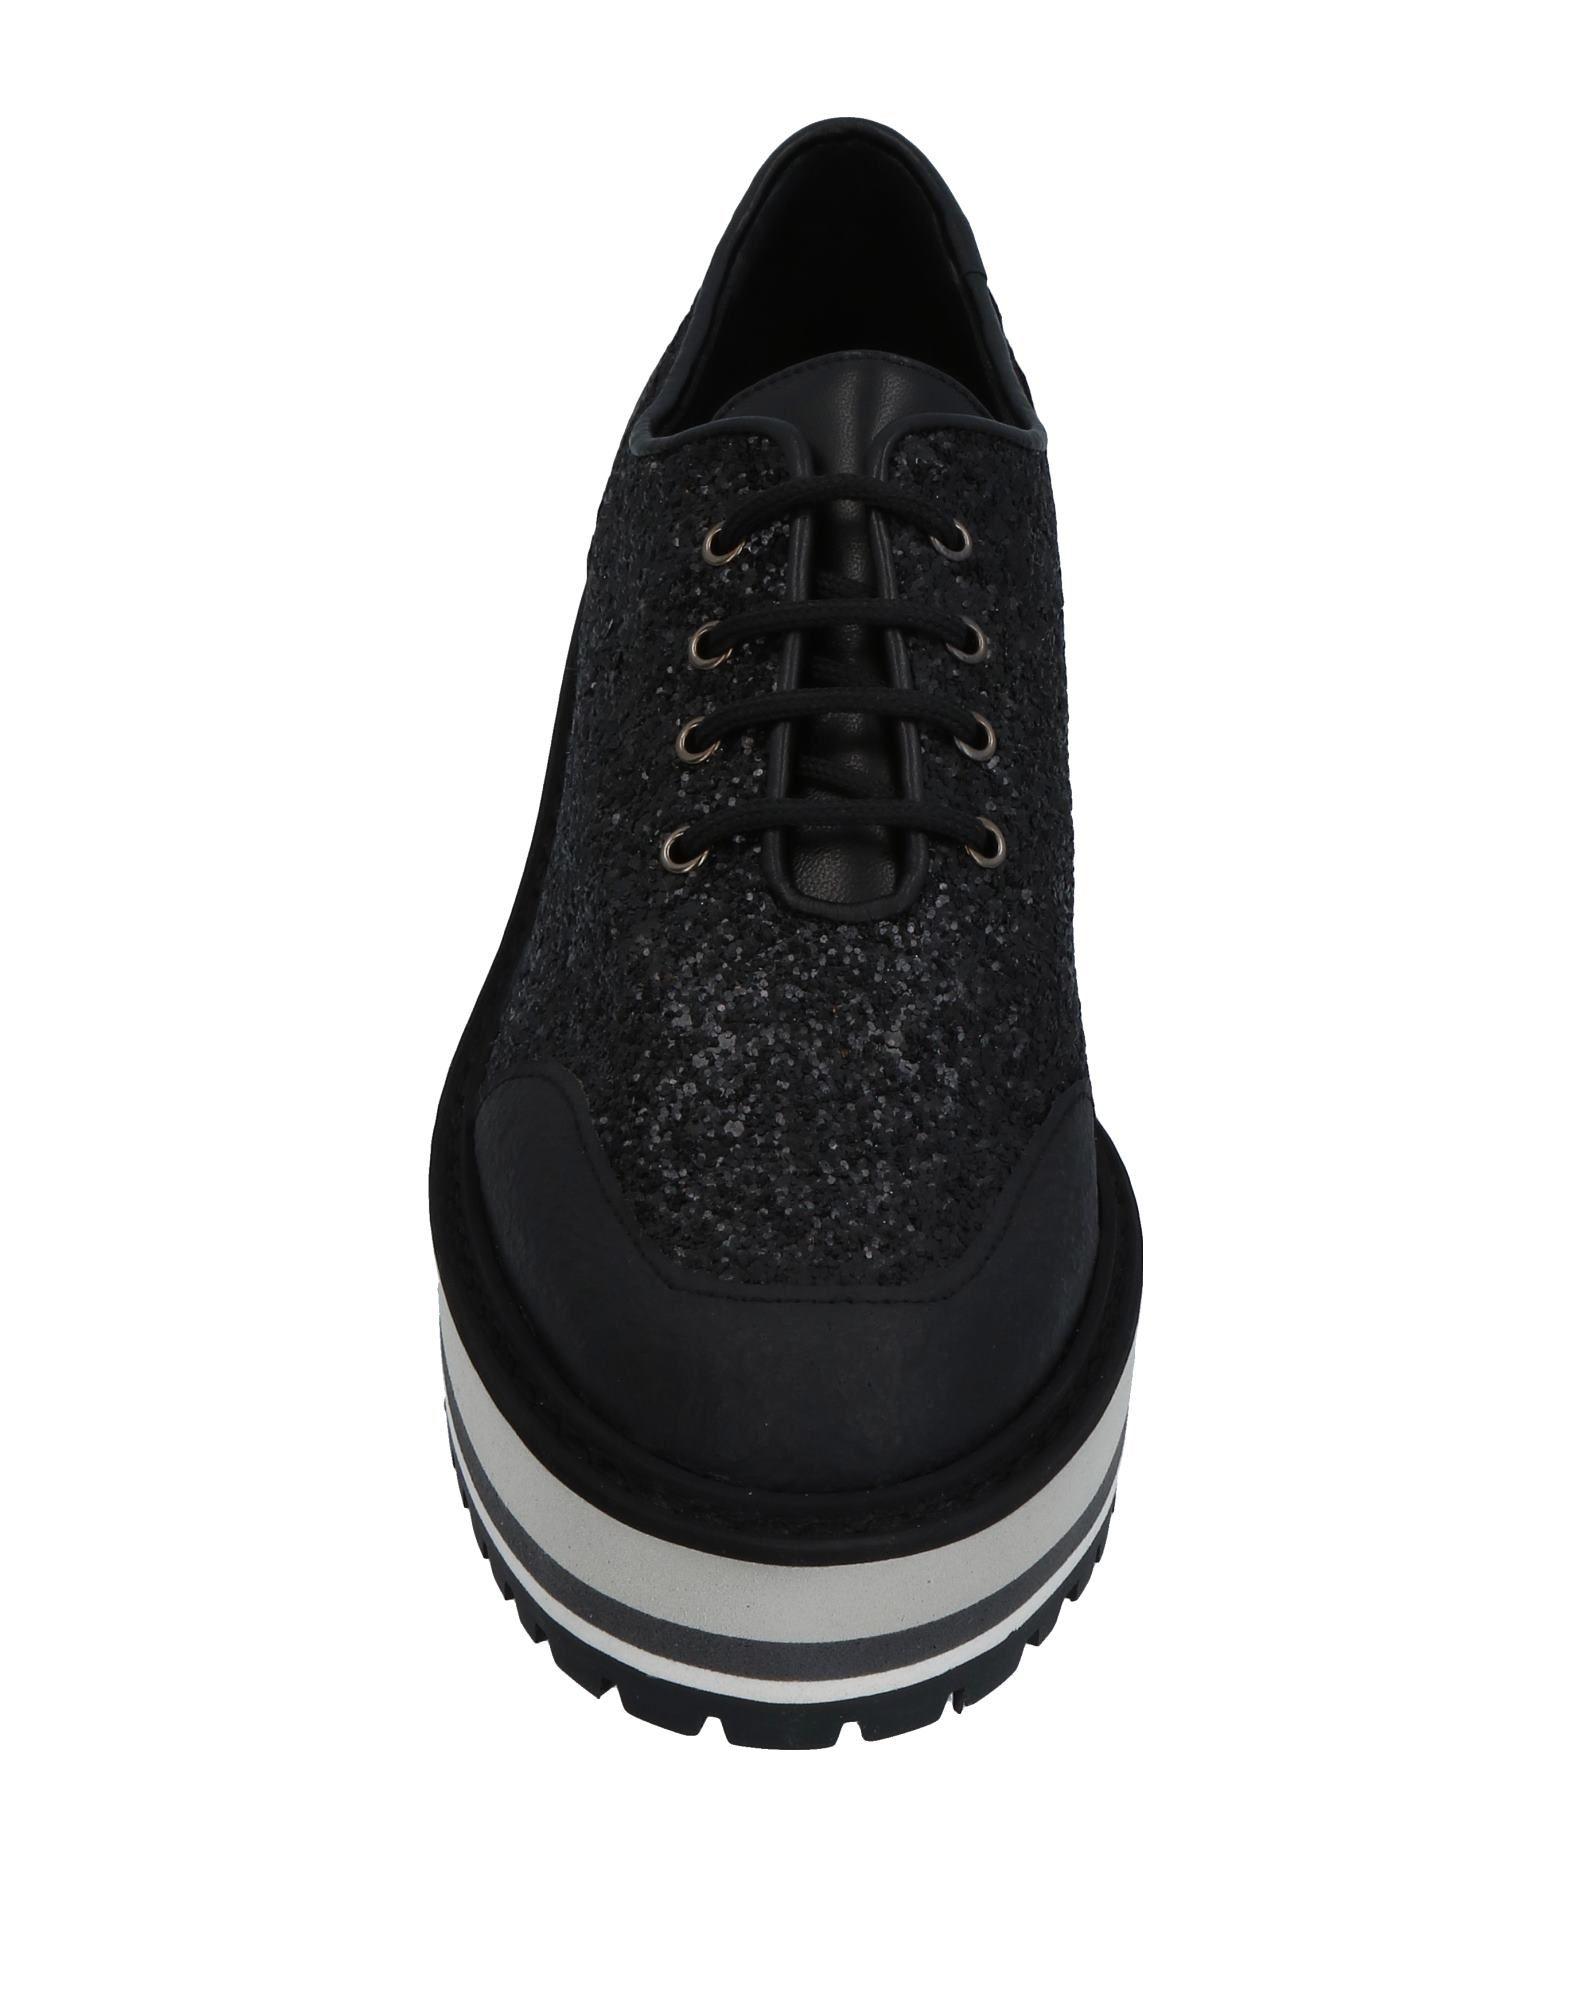 Chaussures À Lacets Vicini Tapeet Femme - Chaussures À Lacets Vicini Tapeet sur